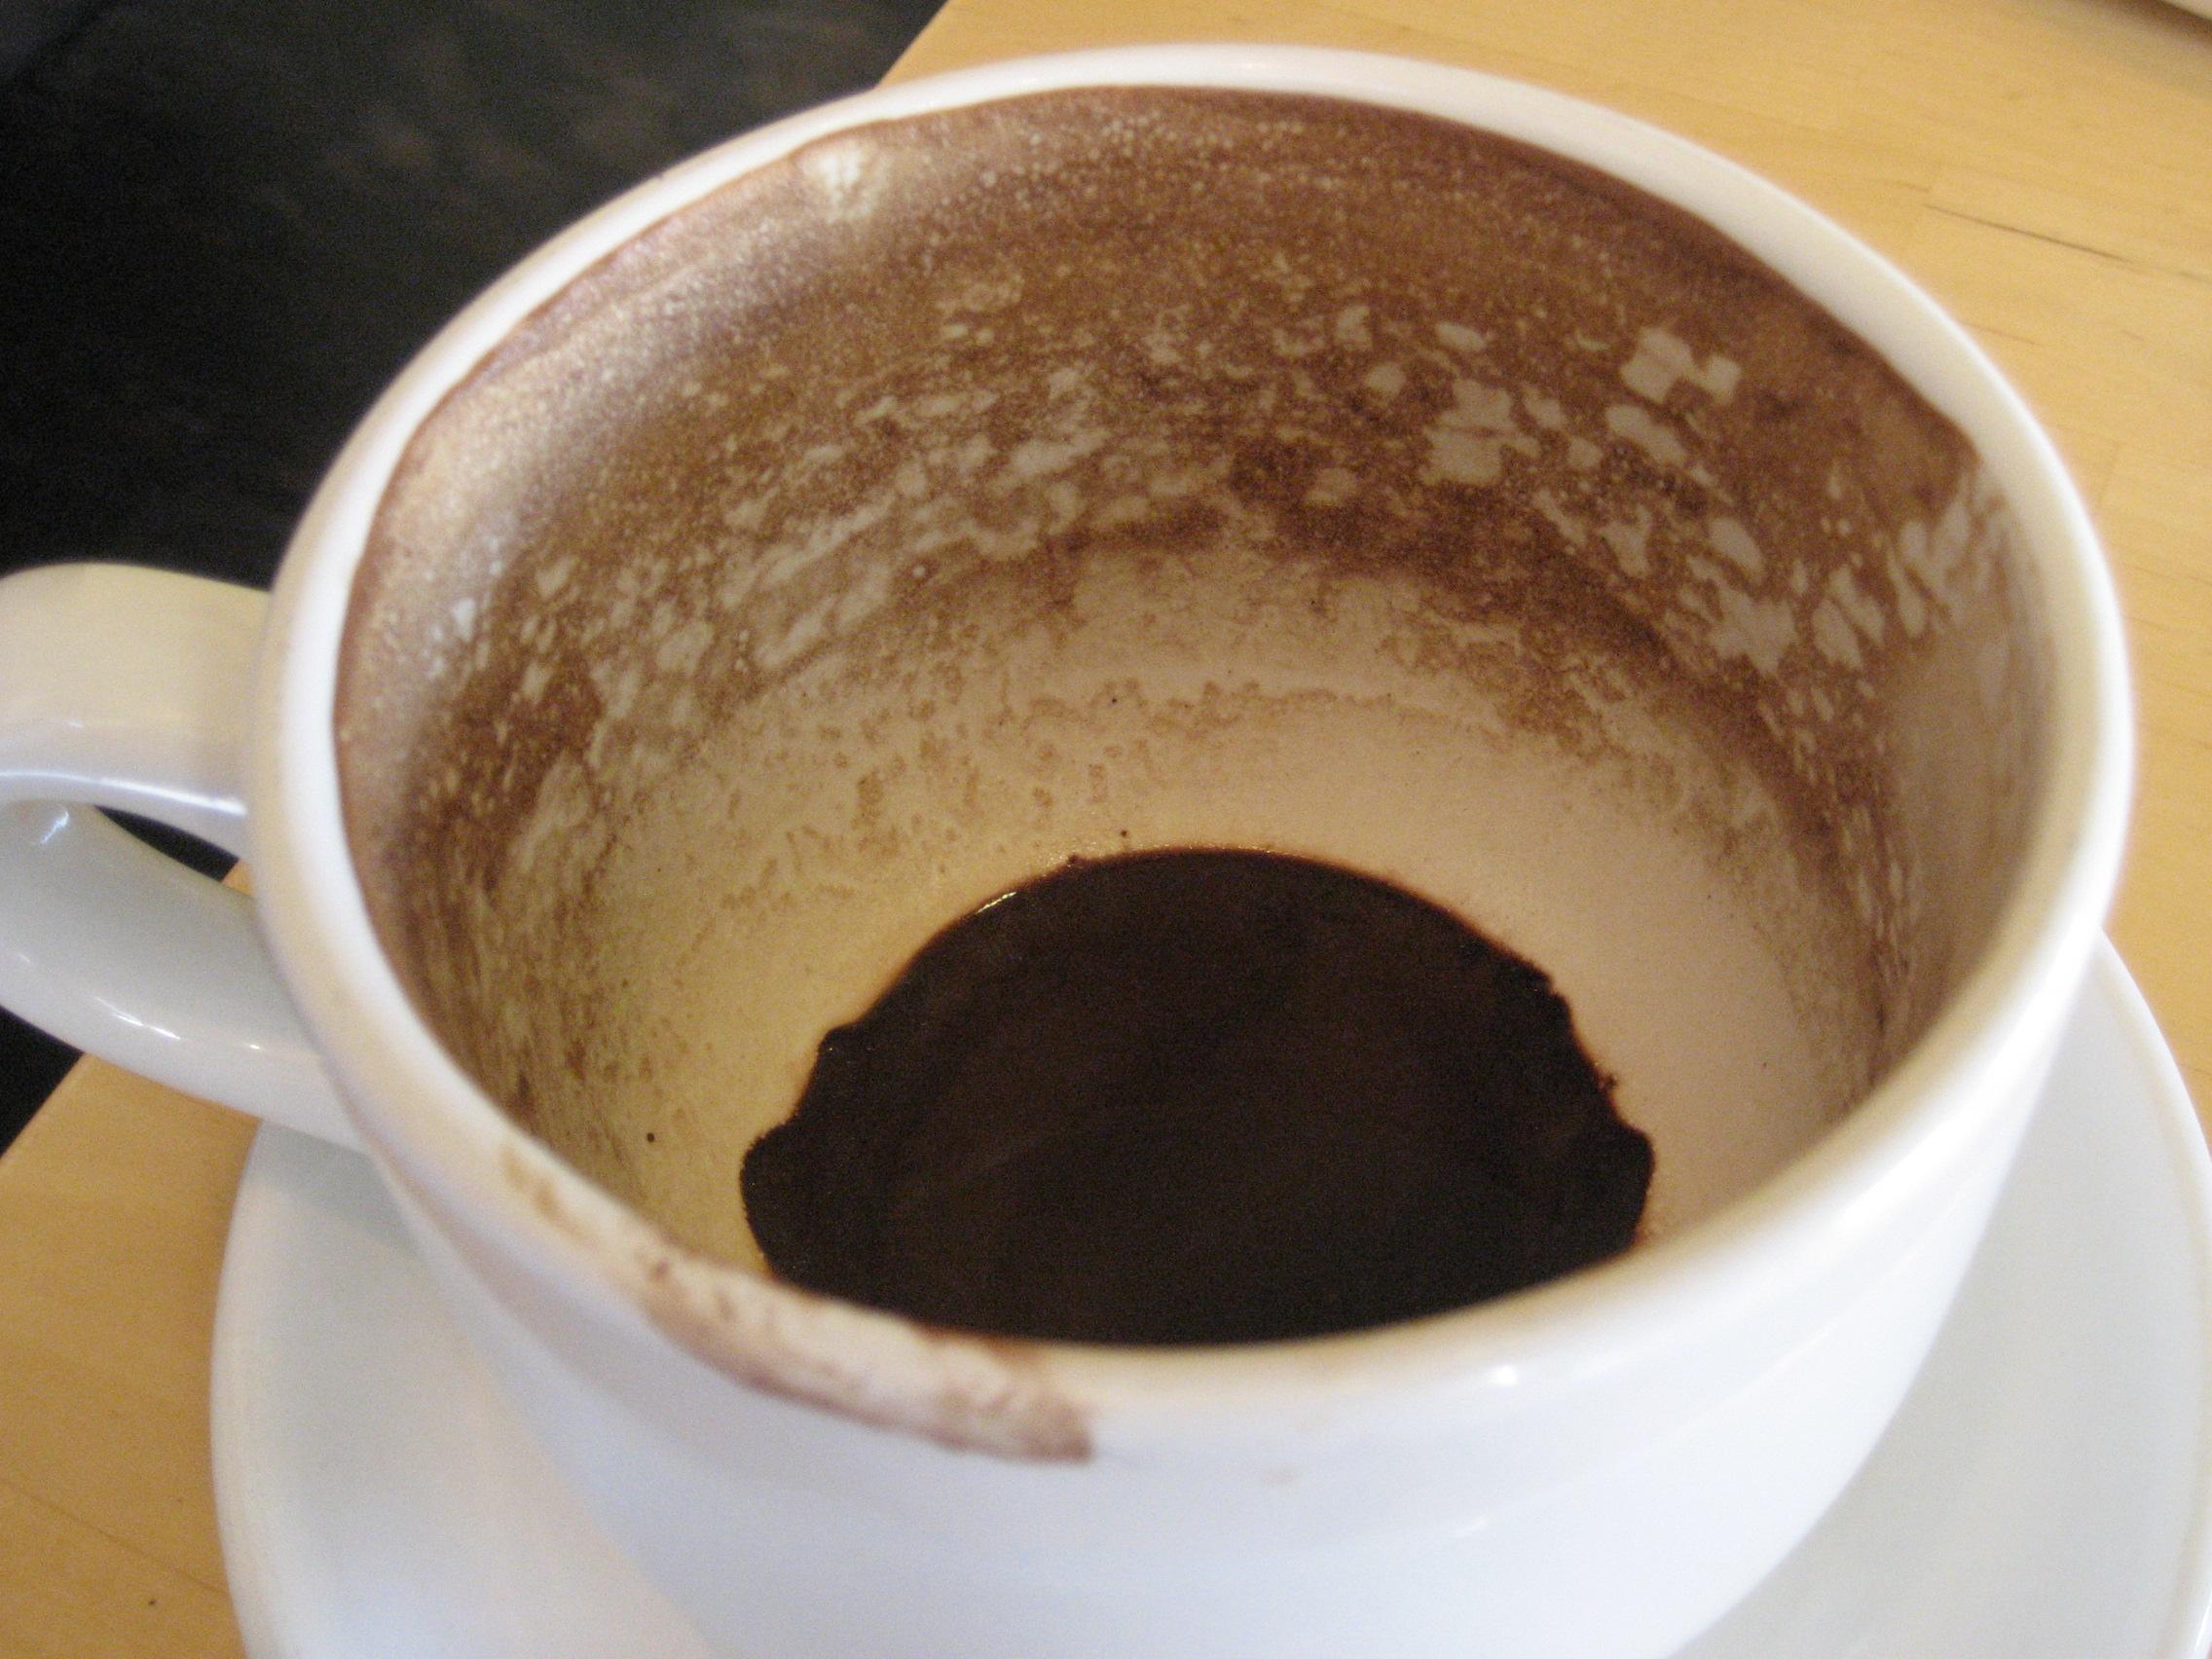 Dregs of mocha in a mug